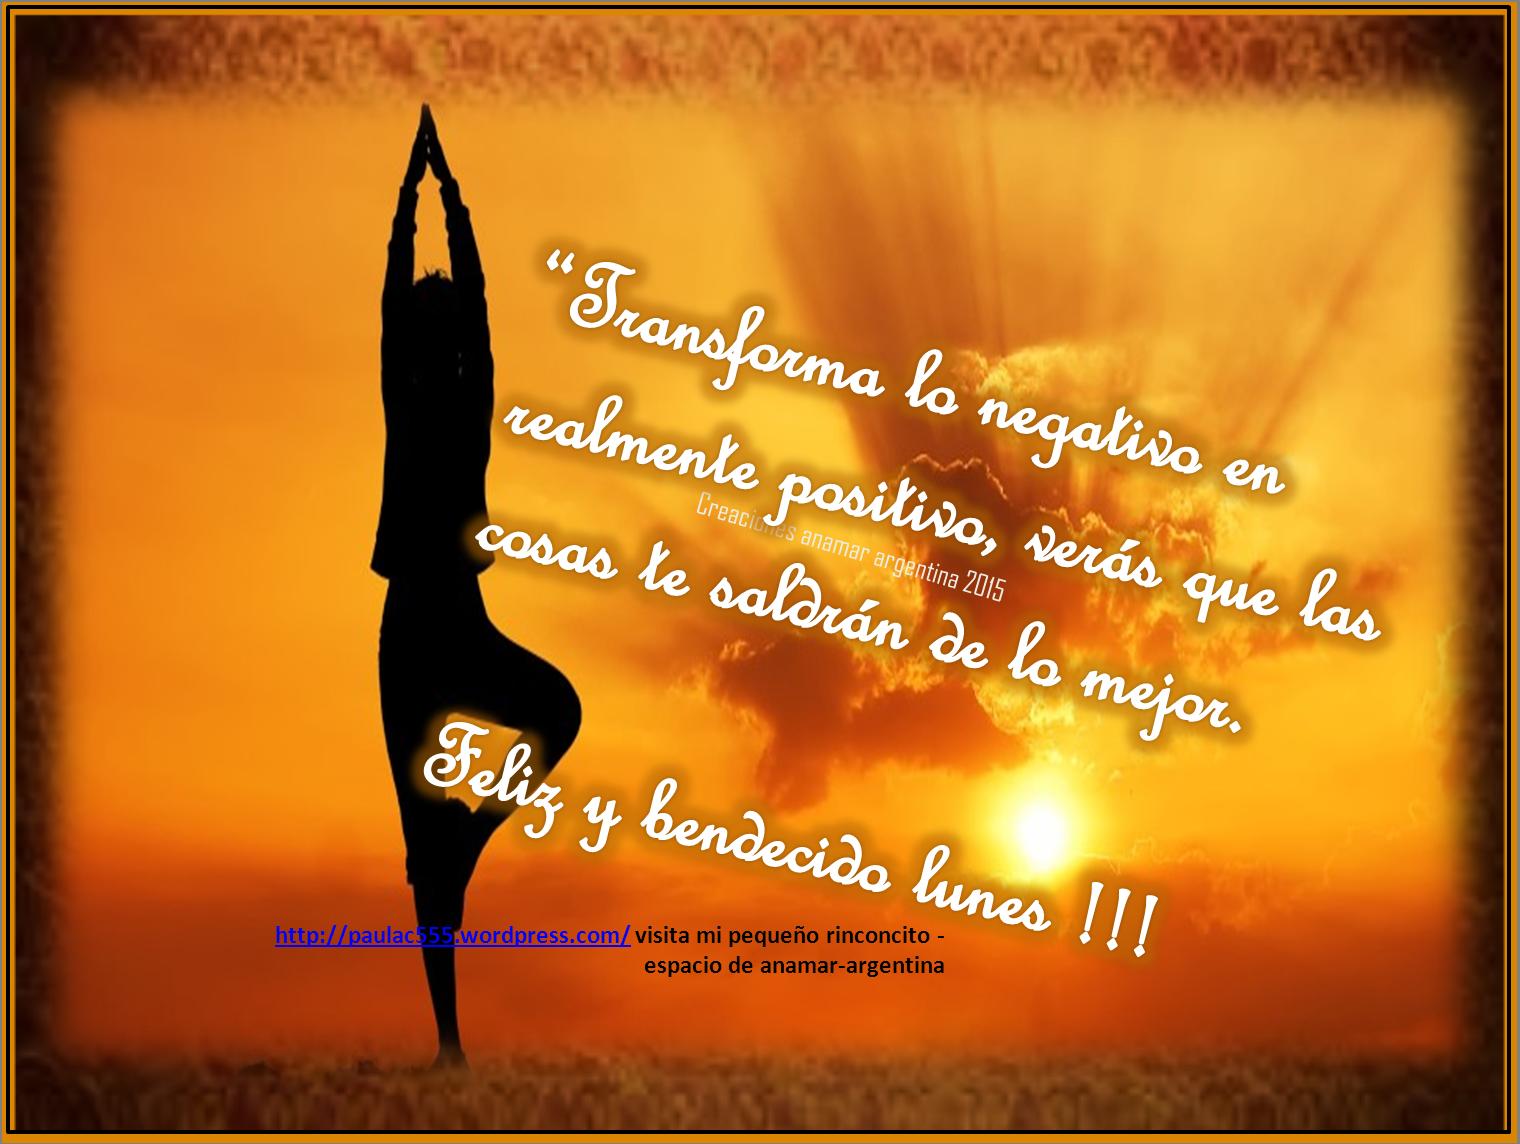 imagen frases motivadoras-positivas-feliz INICIO DE SEMANA  -anamar-argentina-2015